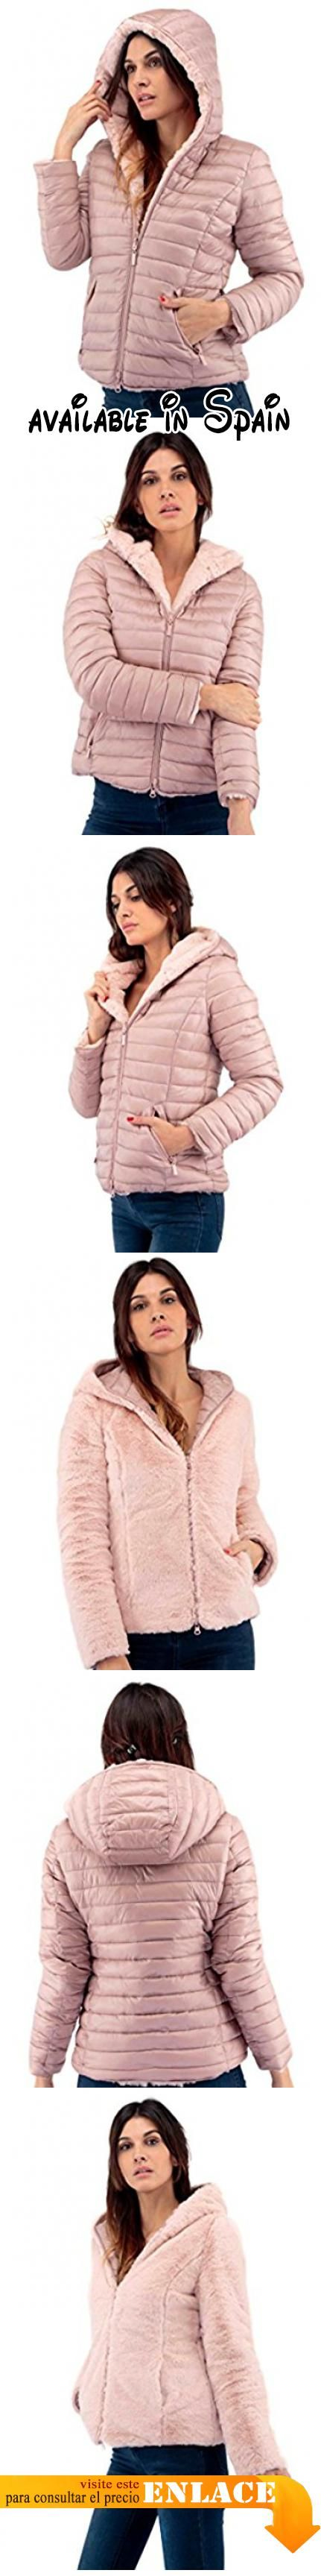 B078BN9P42 : Plumas reversible para mujer color malba (XL). reversible